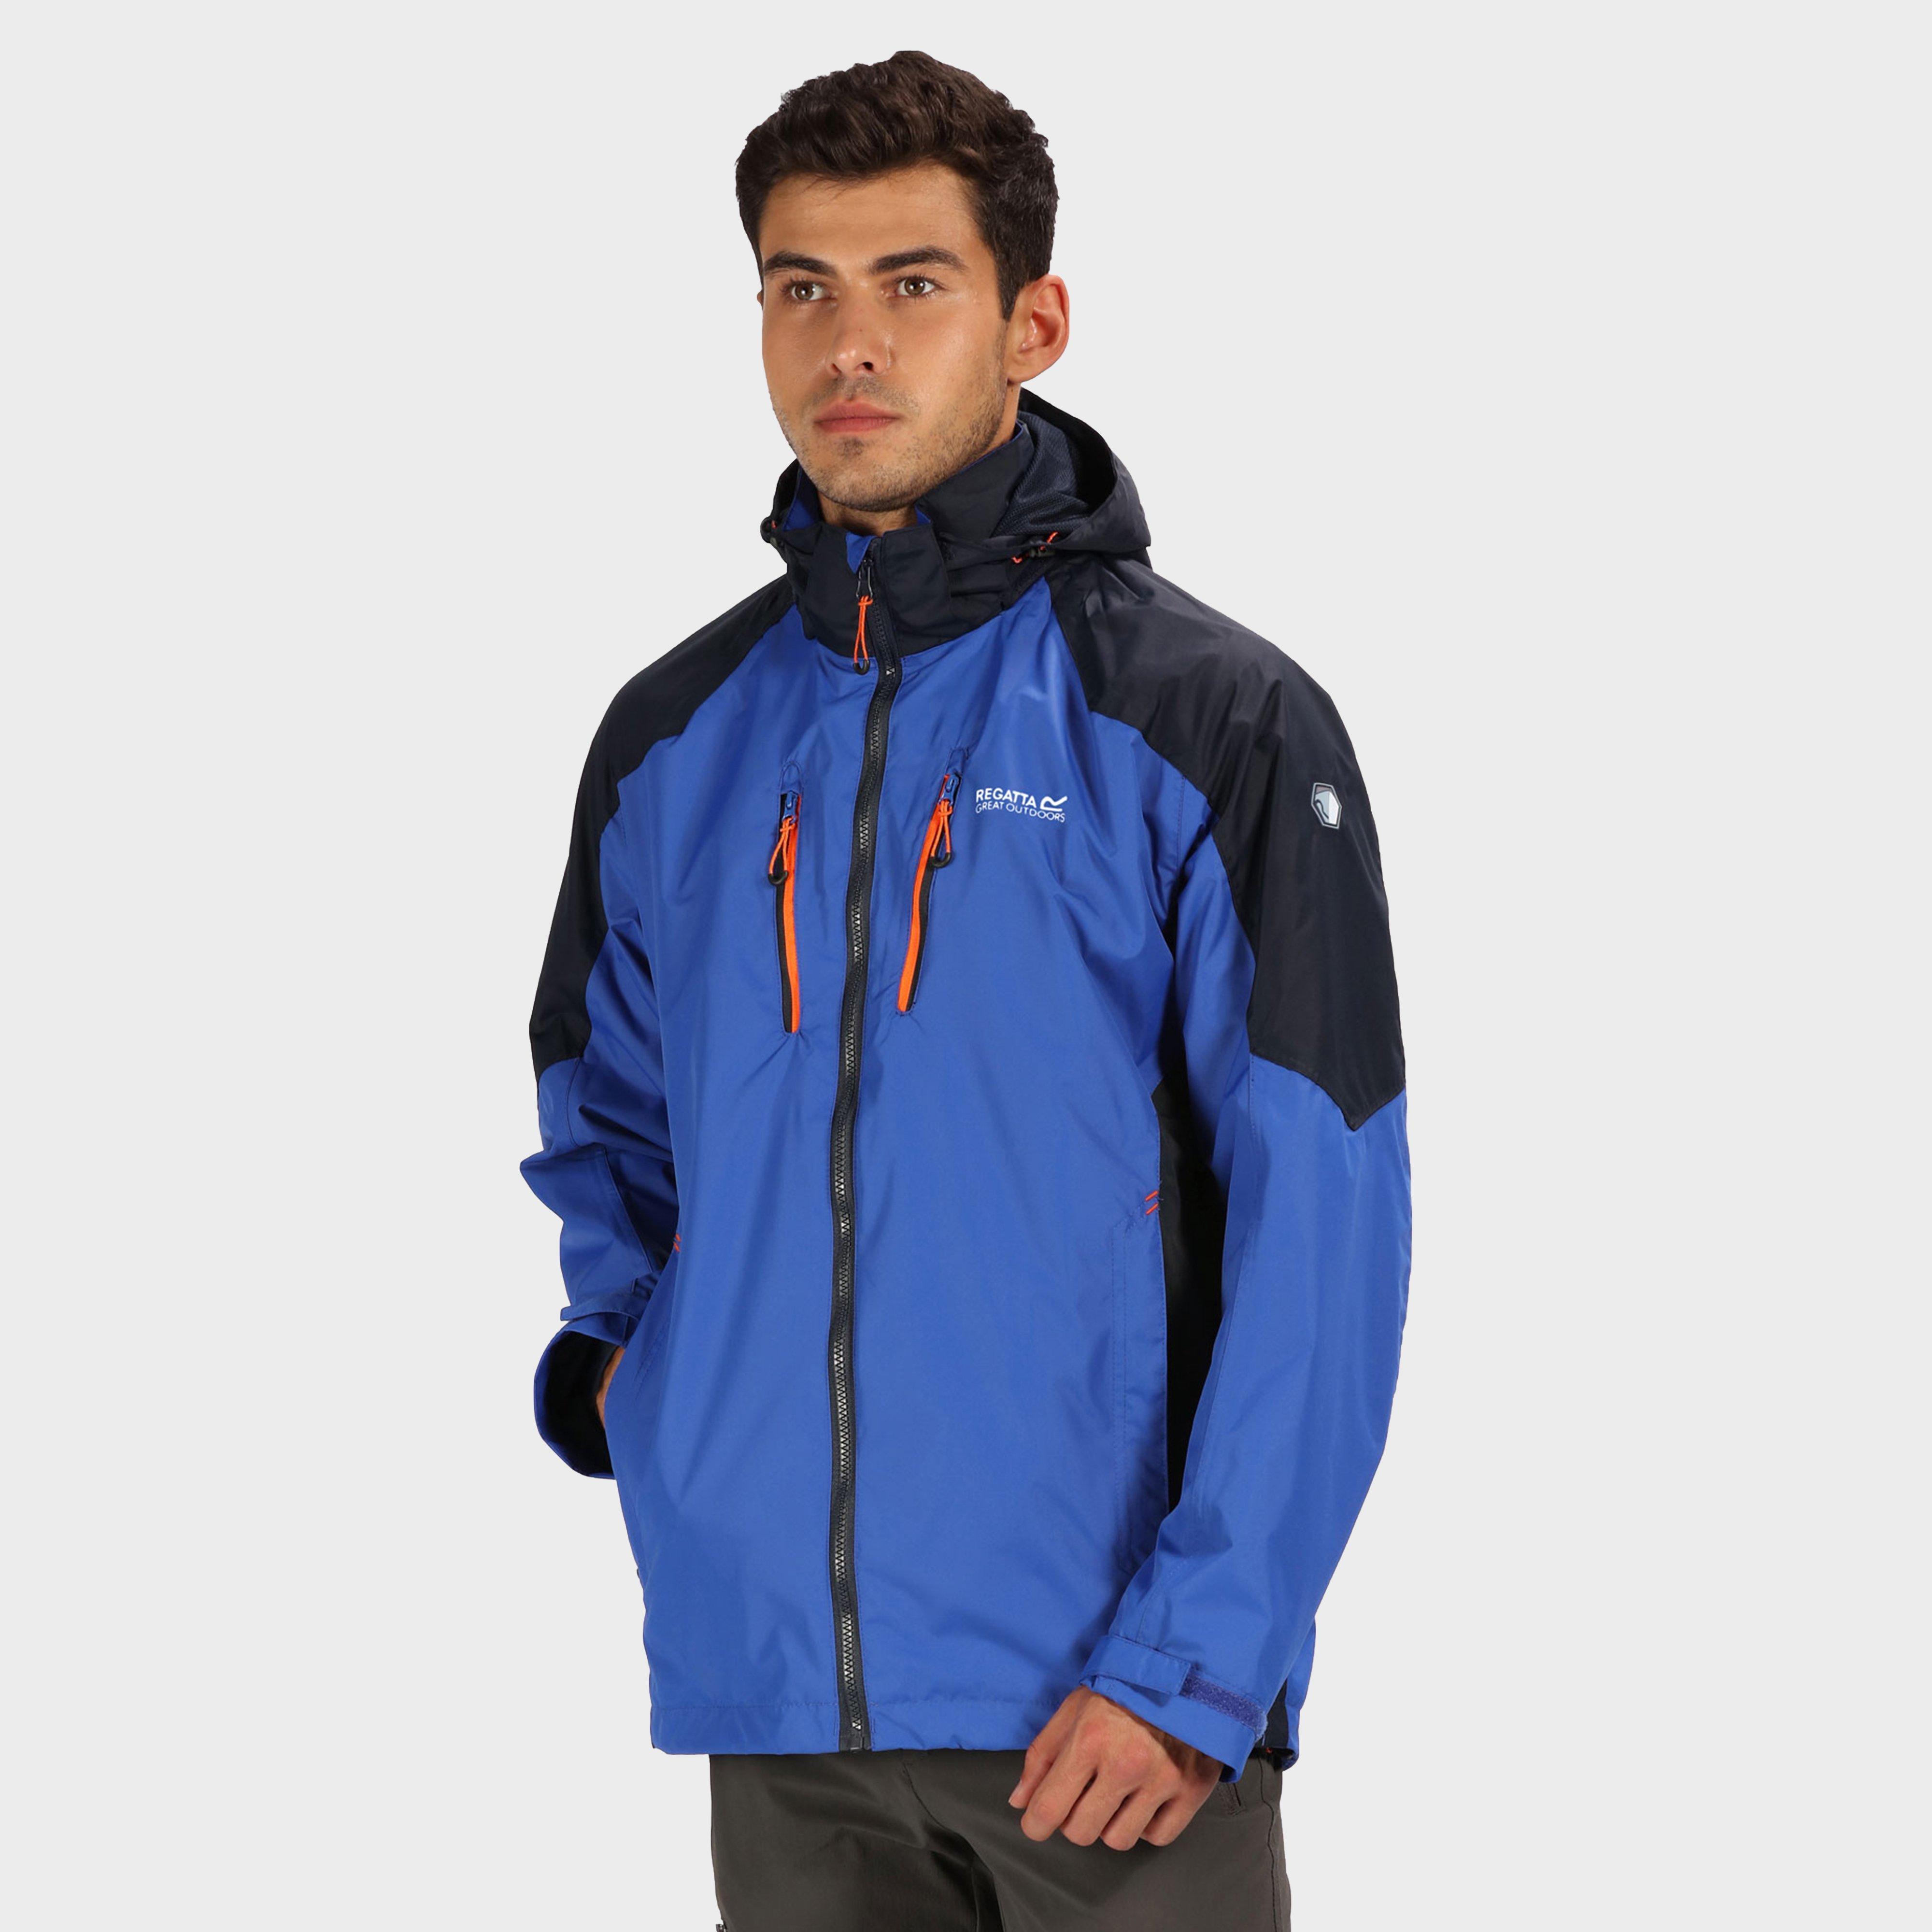 Regatta Regatta Mens Calerdale III Waterproof Jacket - Blue, Blue